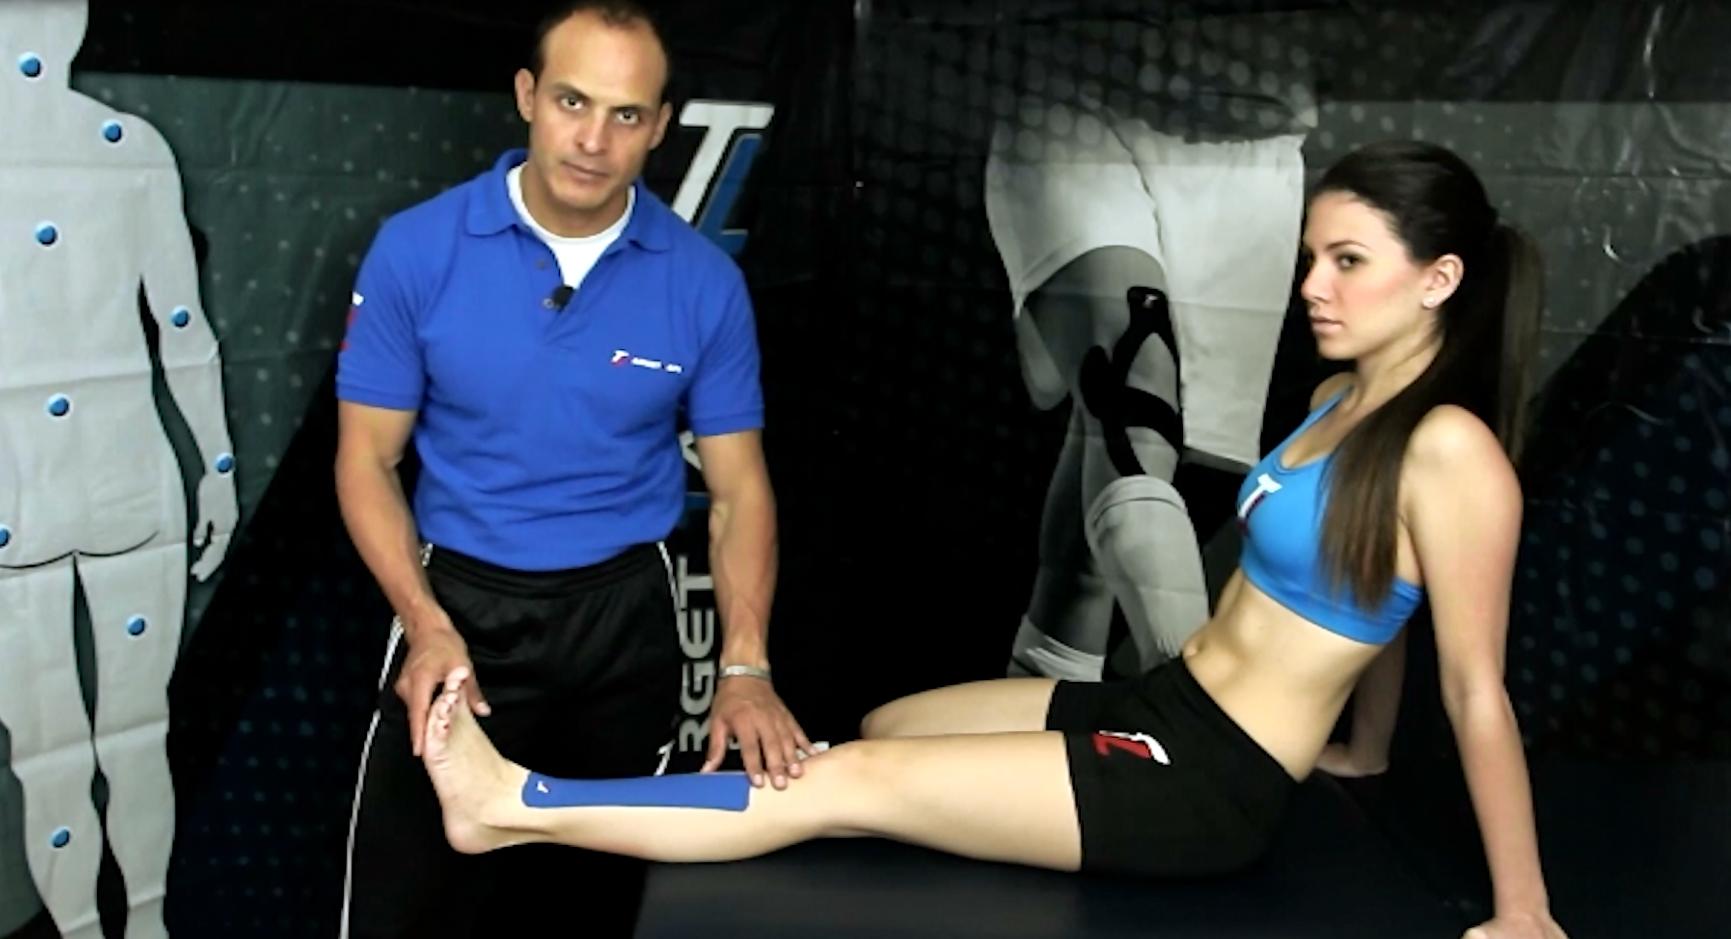 Shin Splints treatment with TT Target Tape